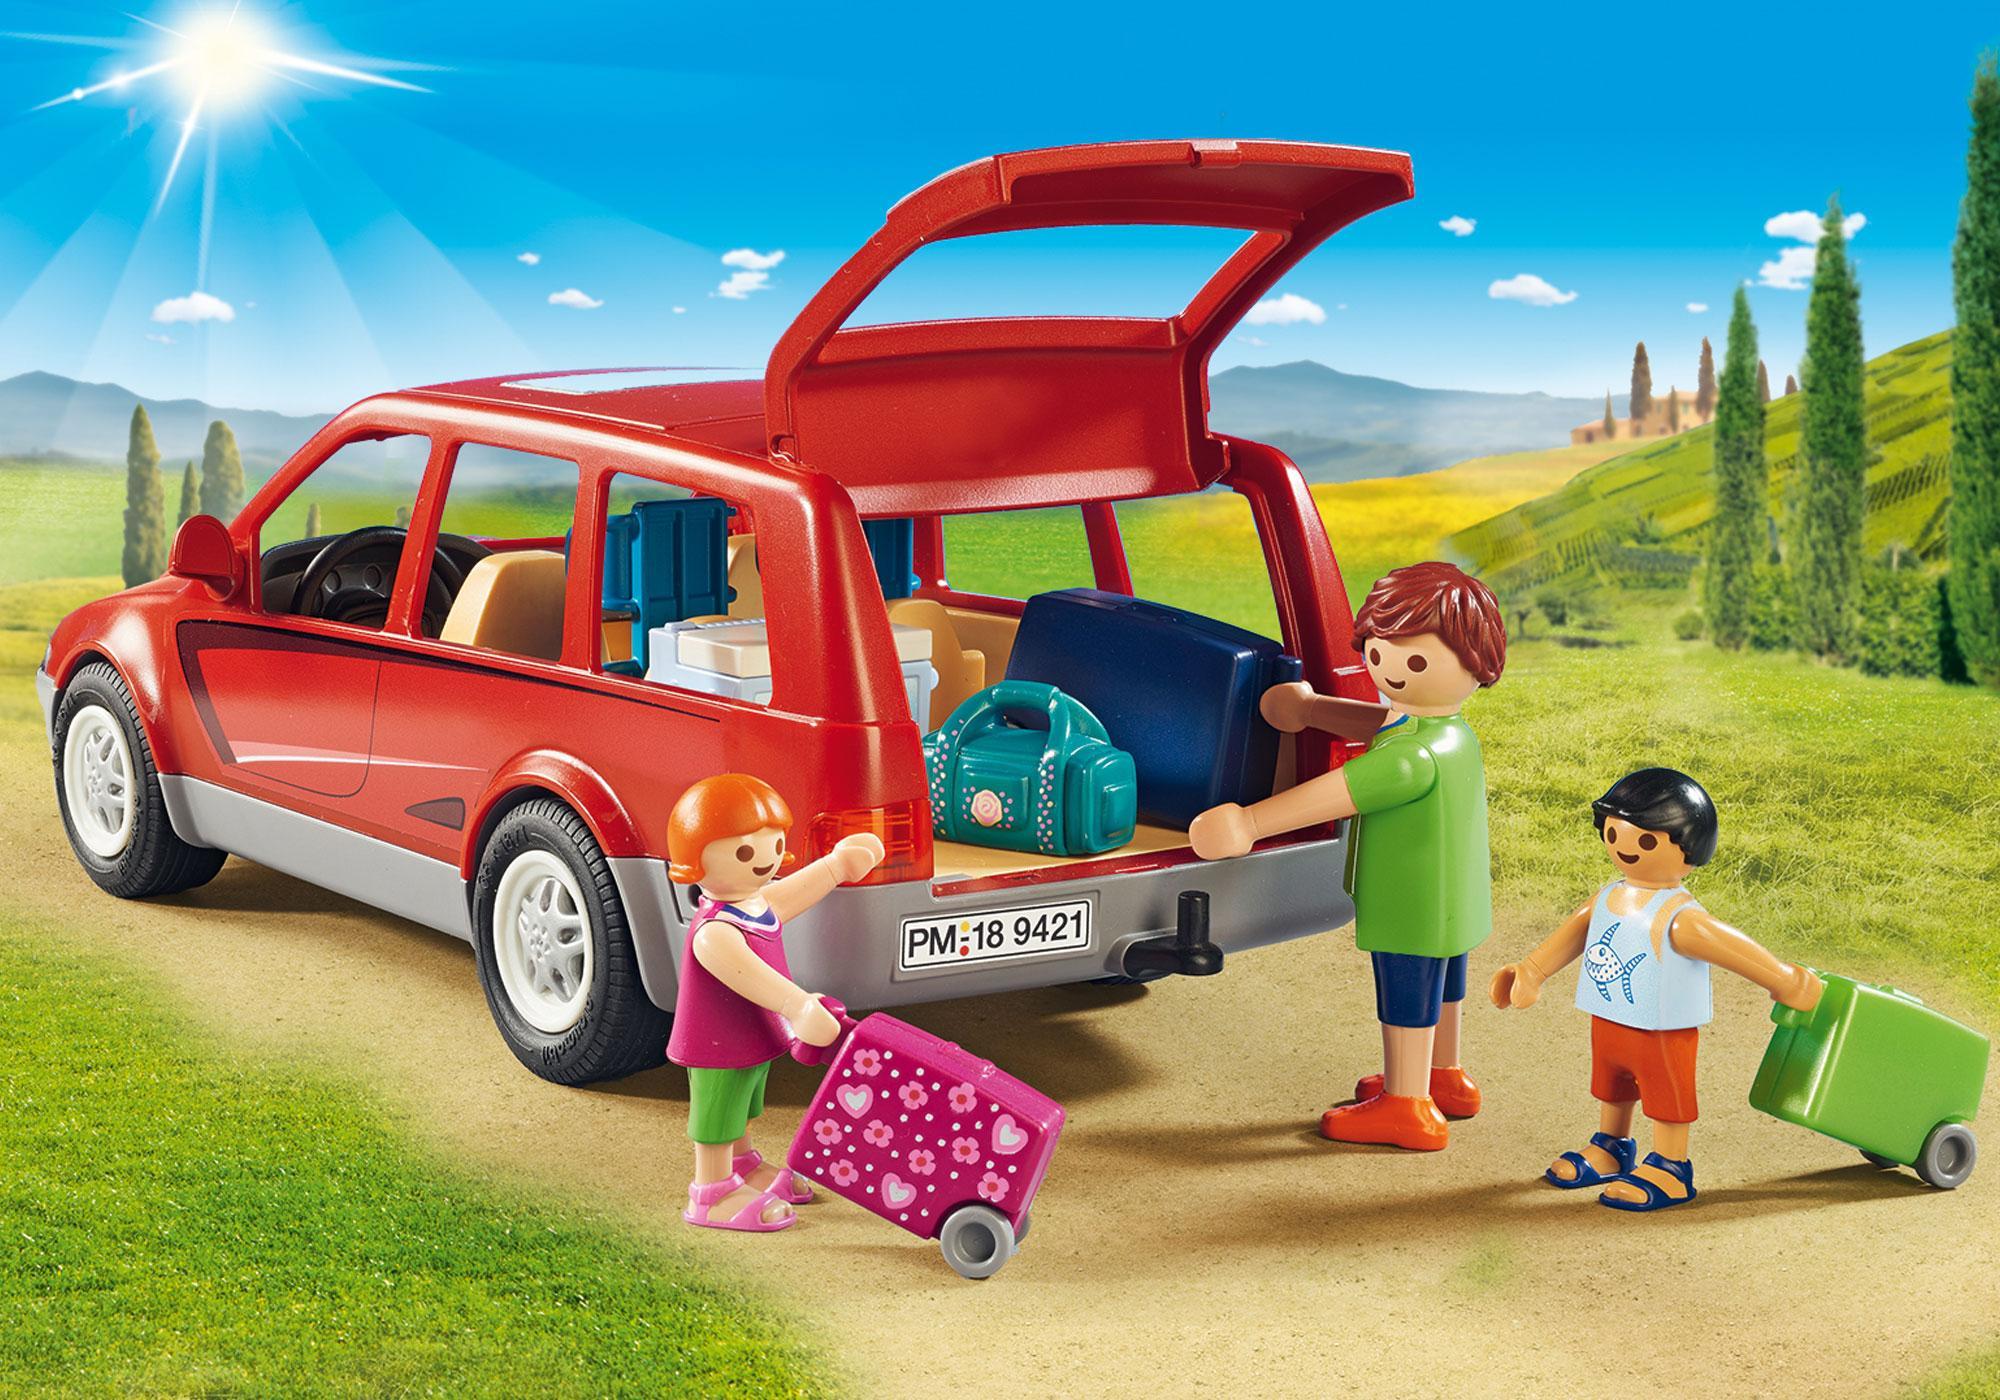 http://media.playmobil.com/i/playmobil/9421_product_extra1/Famille avec voiture